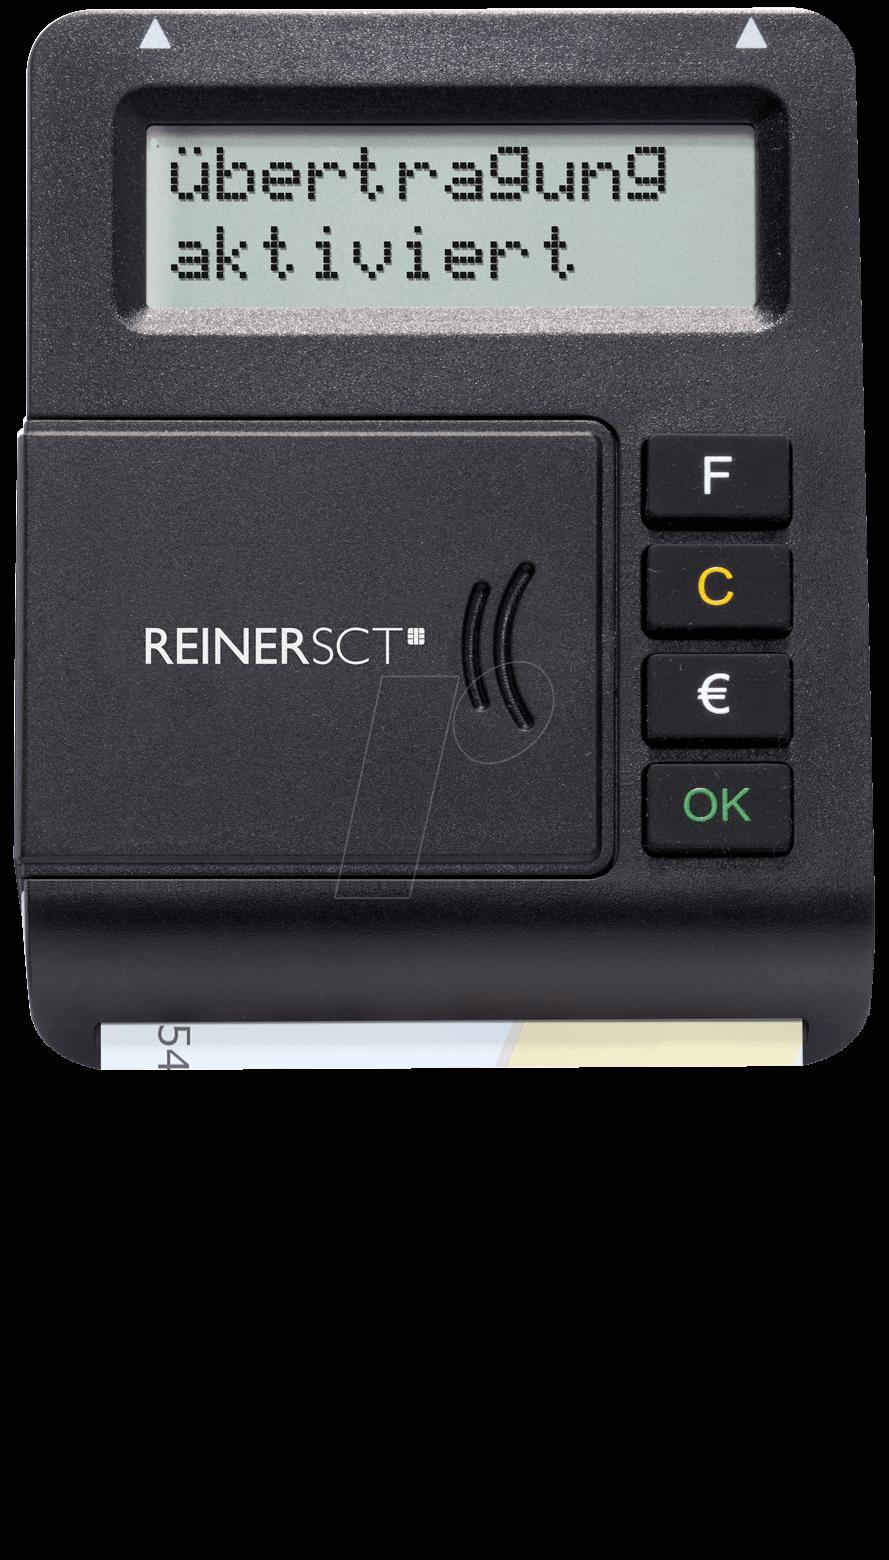 https://cdn-reichelt.de/bilder/web/xxl_ws/R800/RSCT_TANJACK_OPTIC_CX-FRONTAL-KARTE.png